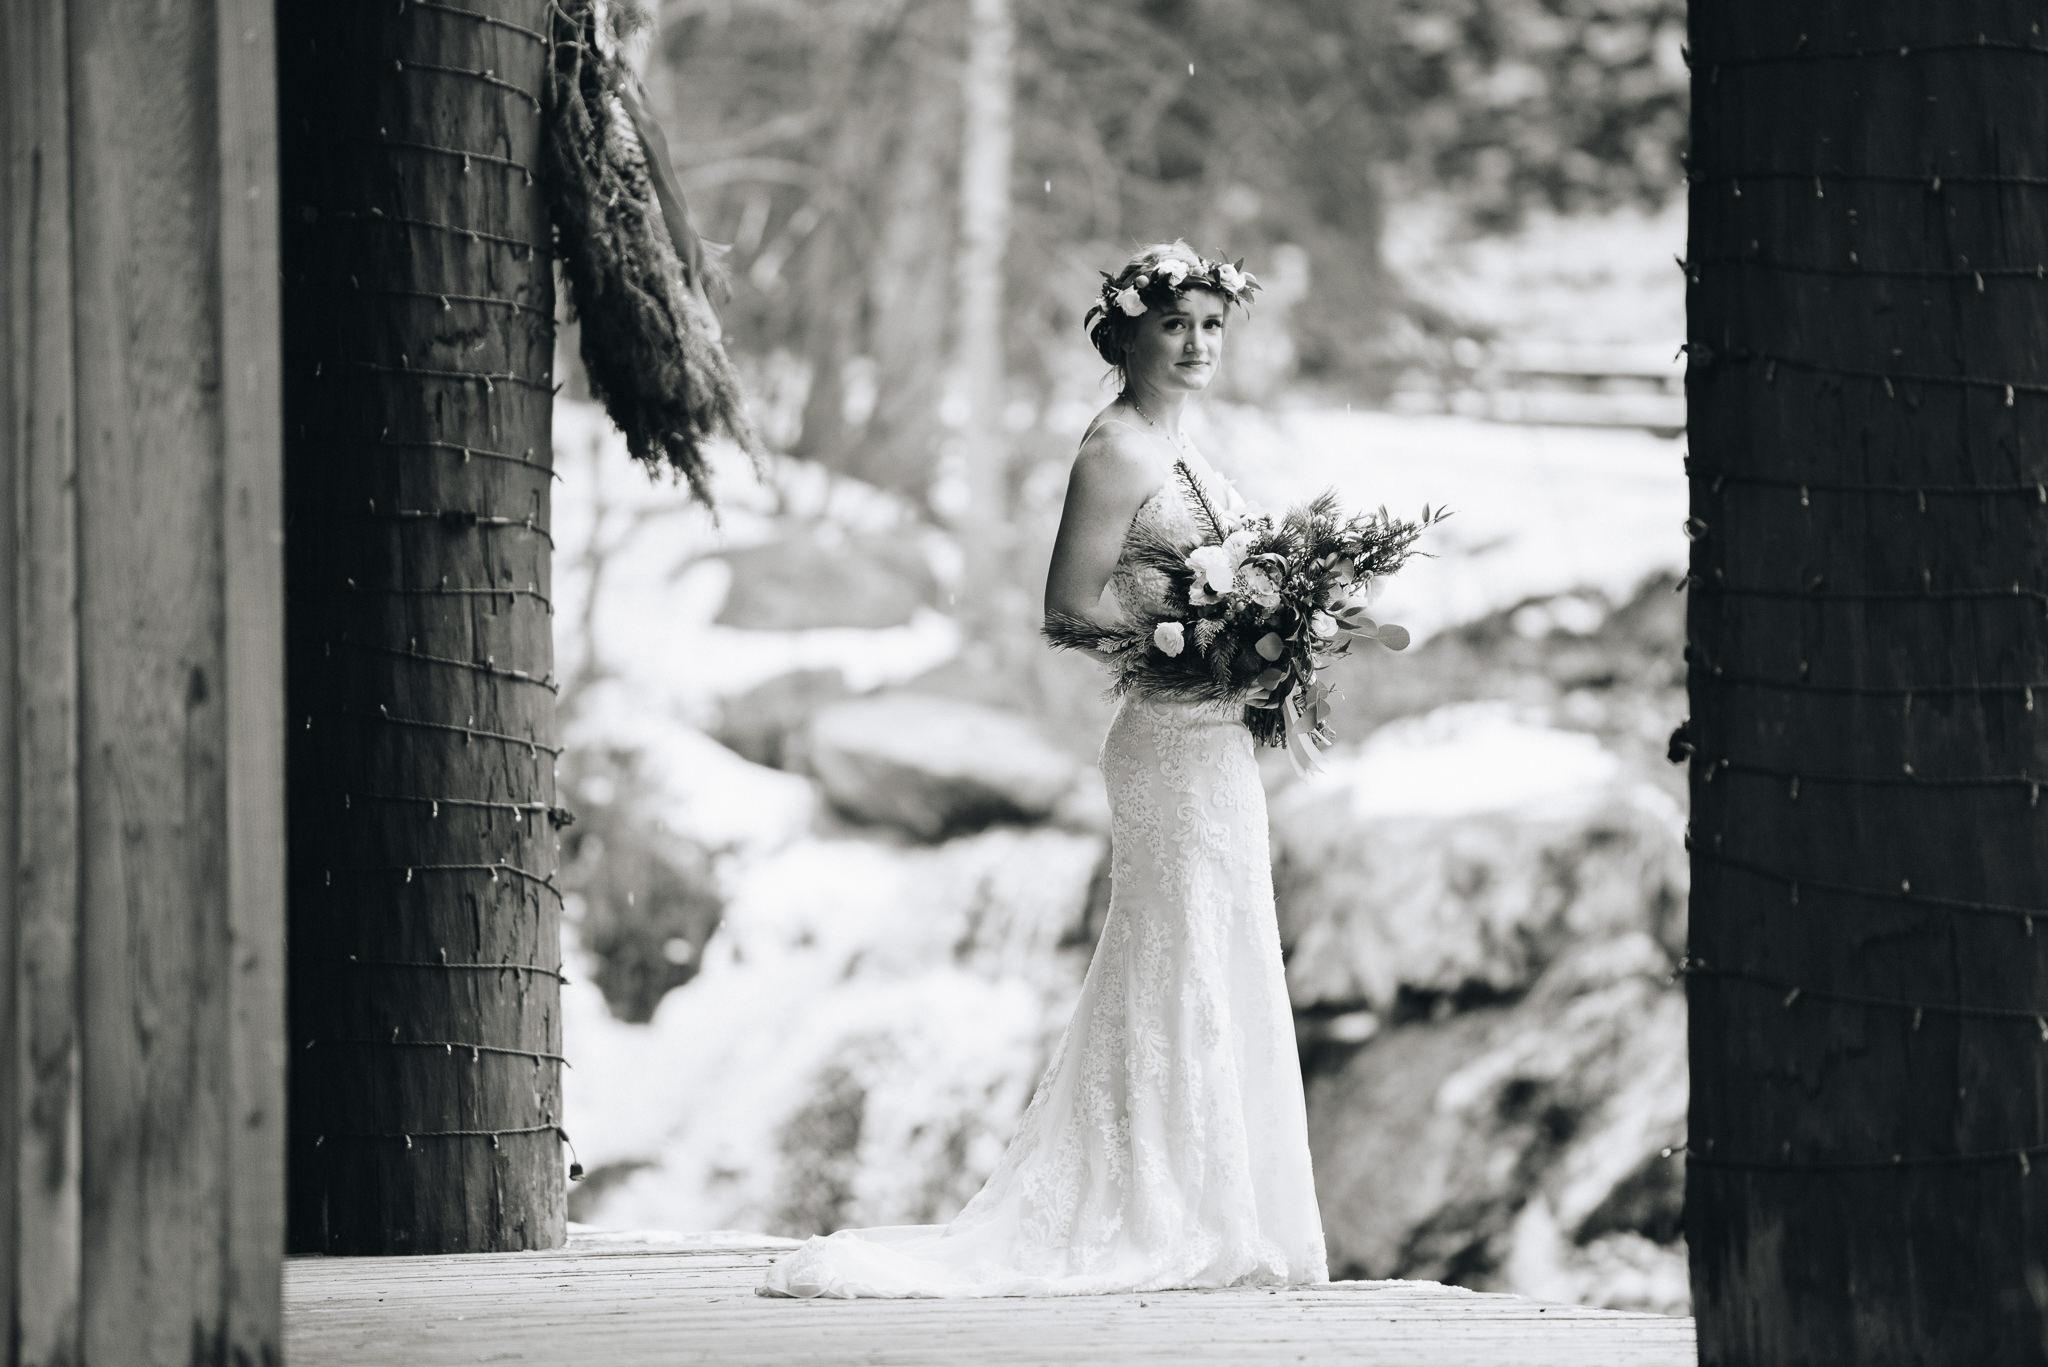 Trevor-Hooper-Wedding-Photographer-The-Bungalow-Wedding-Utah_BW_027.jpg